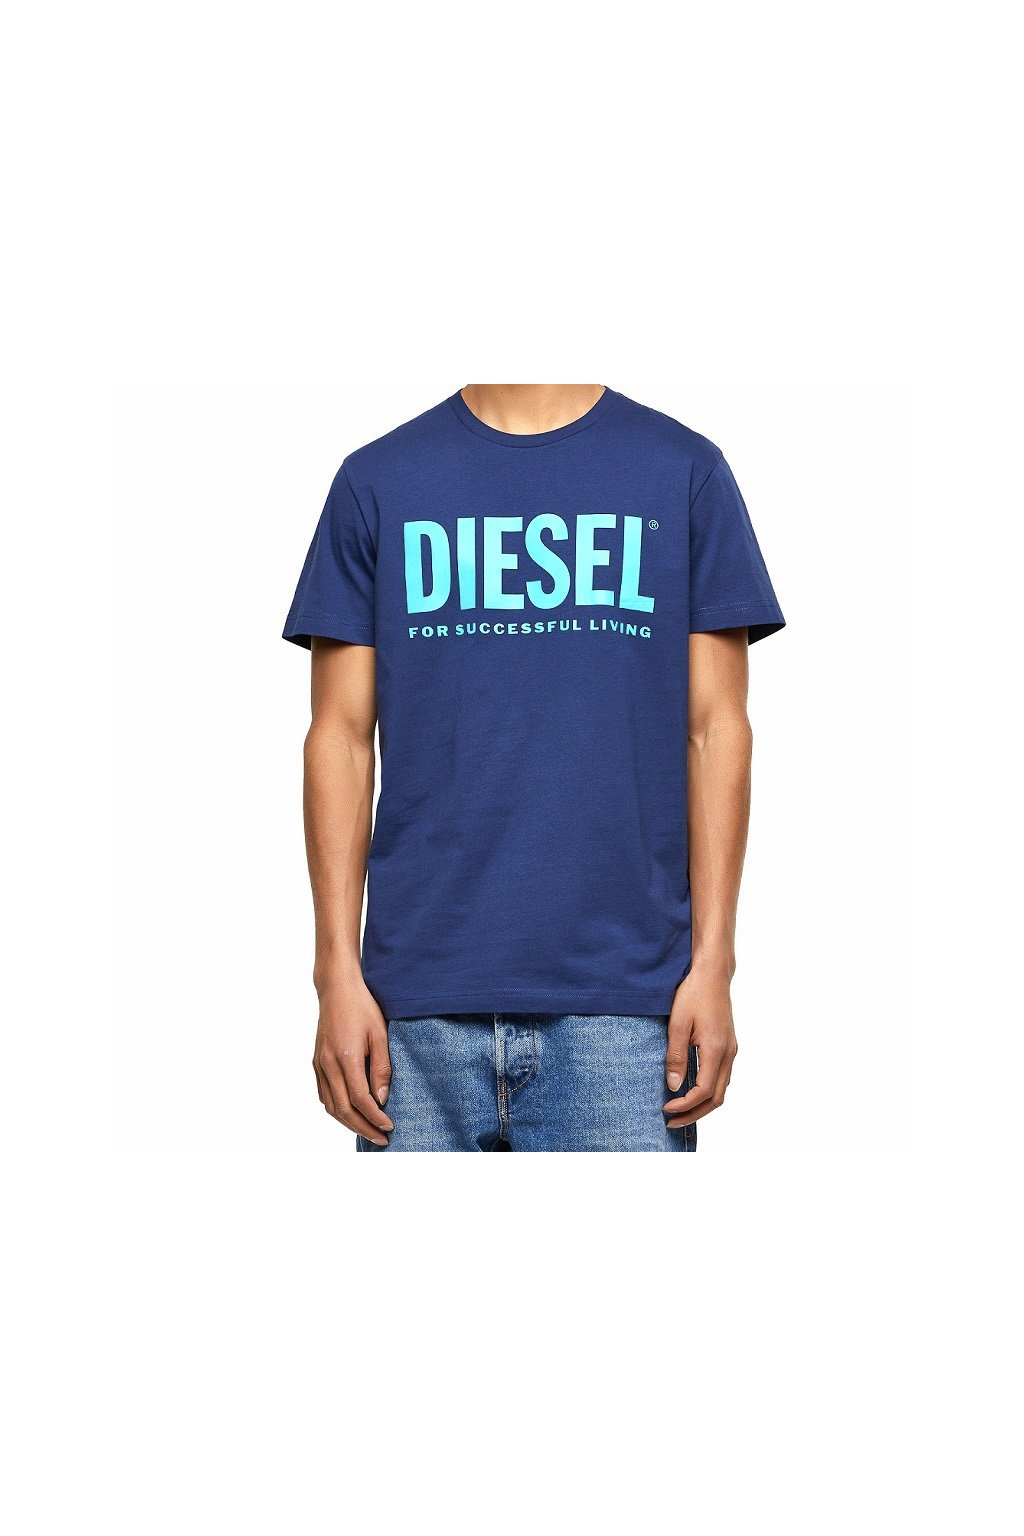 00SXED 0AAXJ 8MG Pánské tričko Diesel T Diego Logo modré